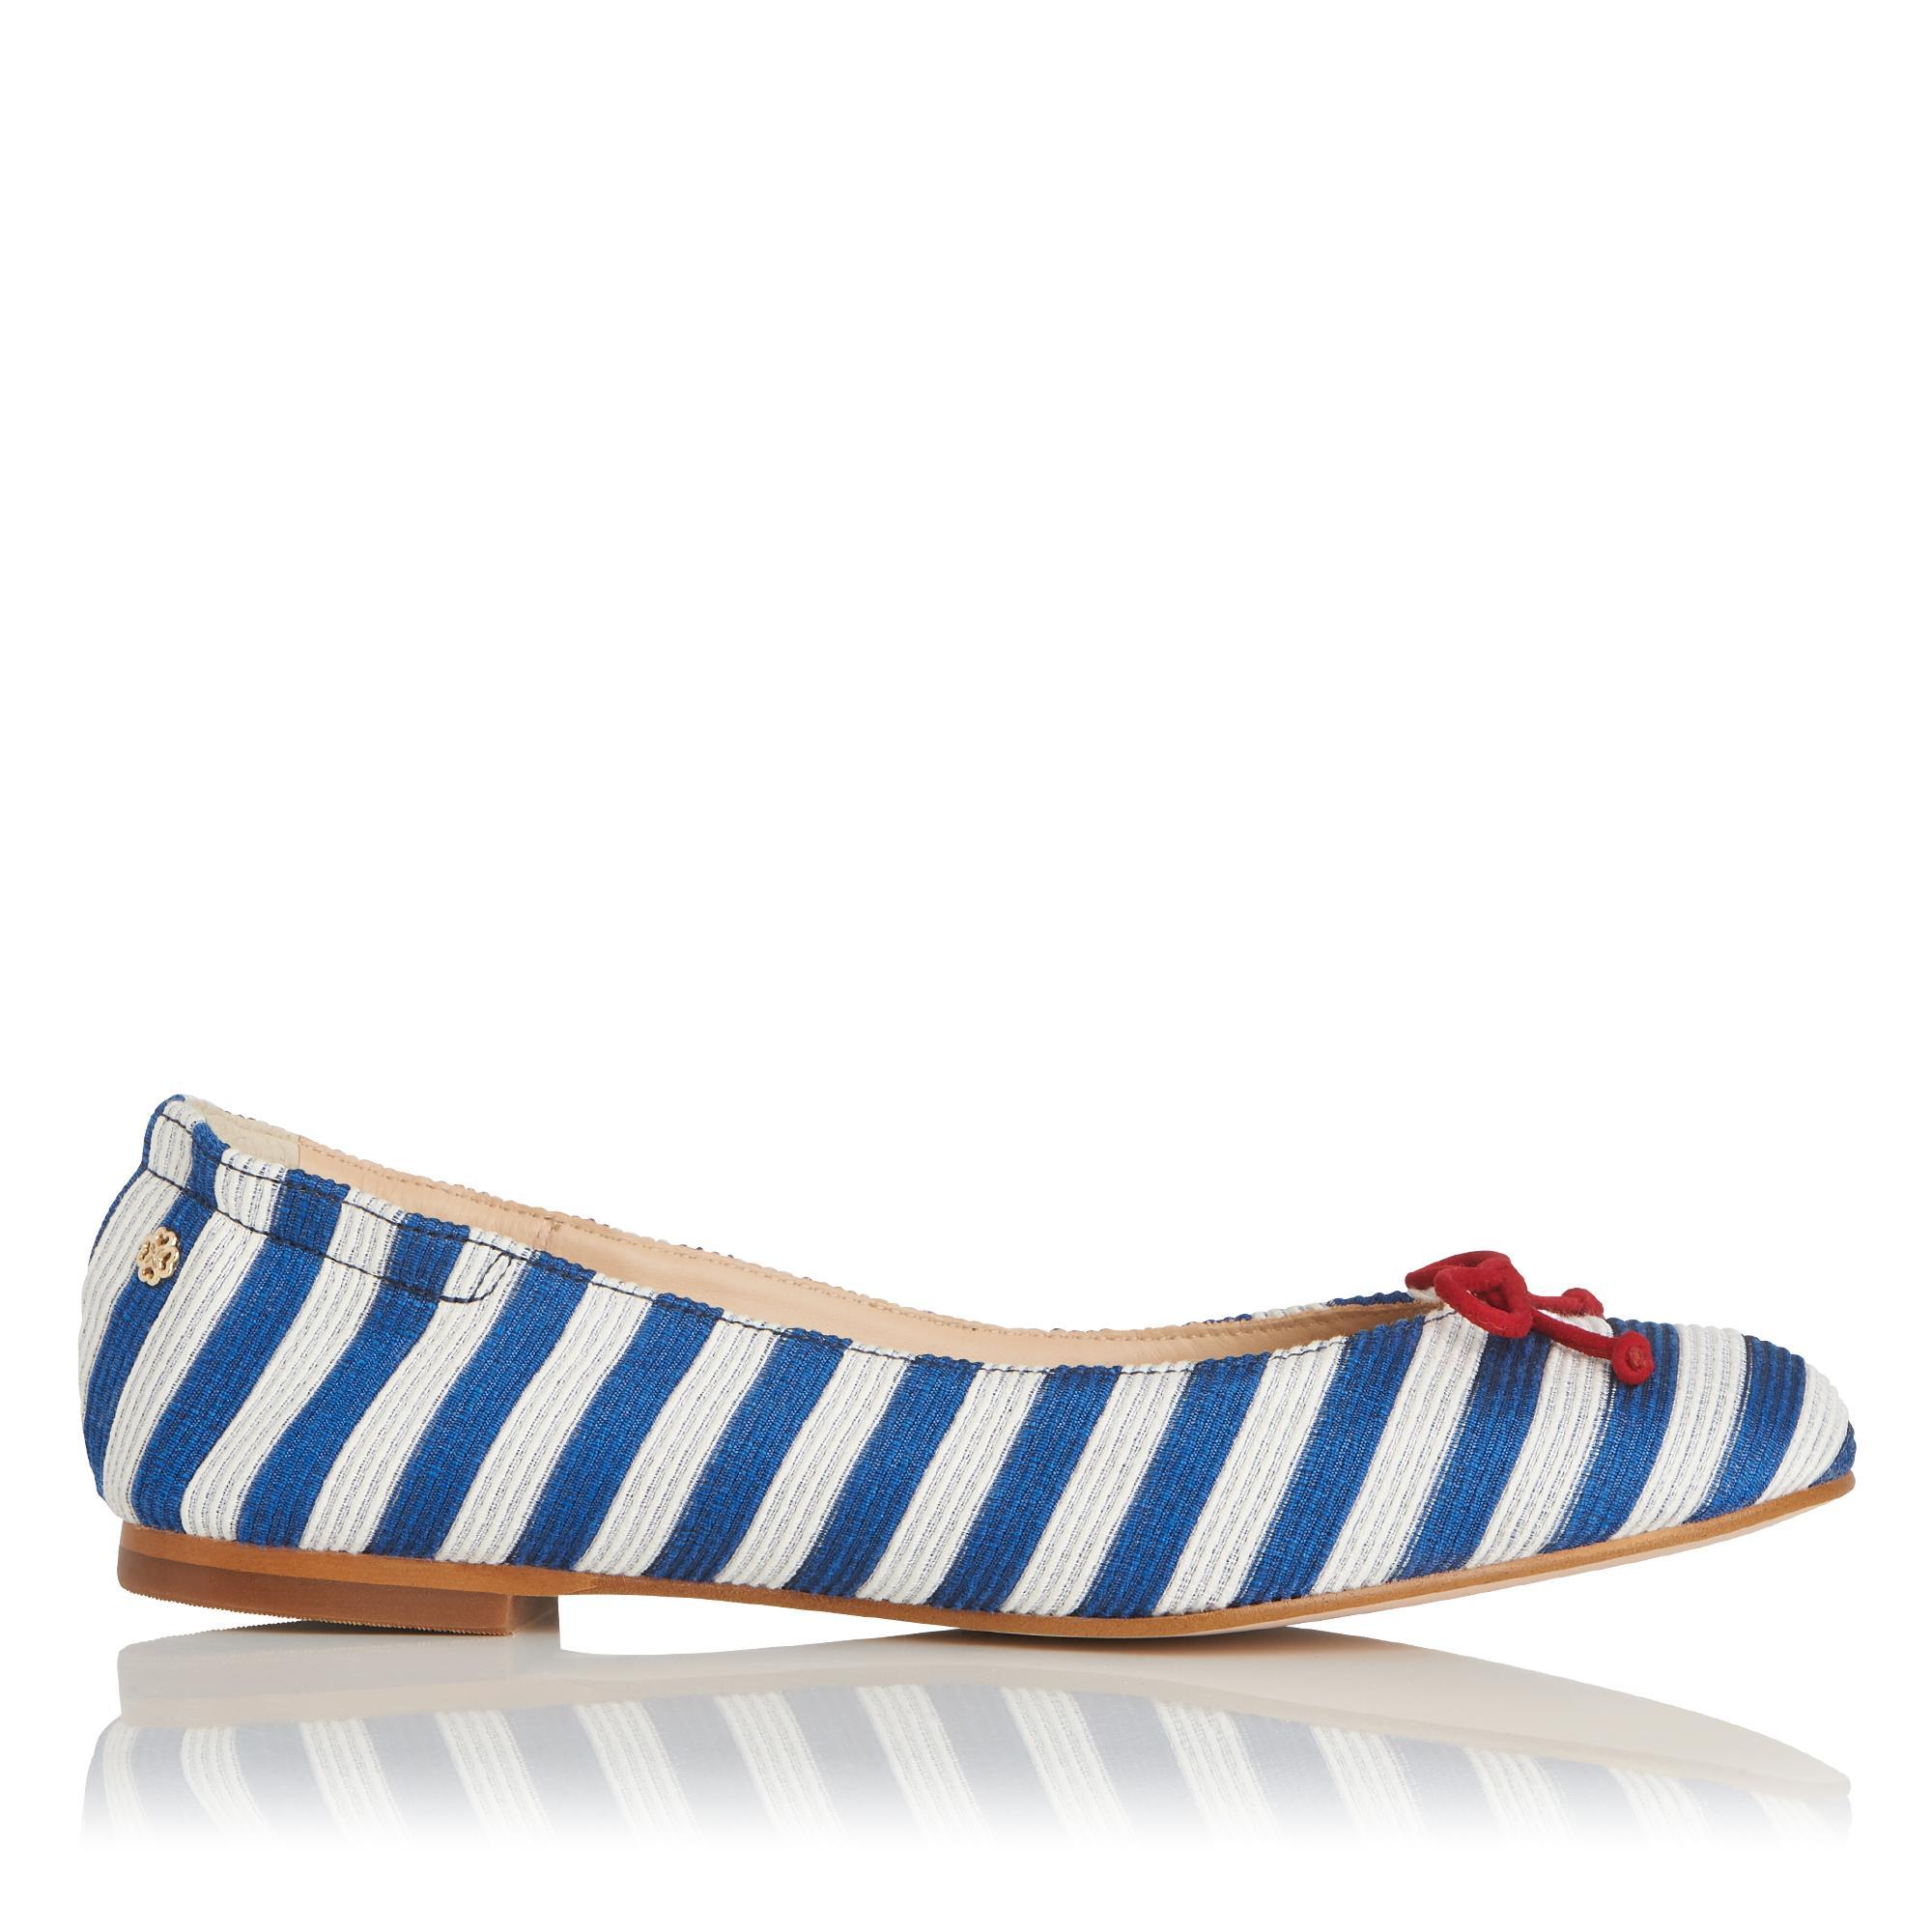 Thea Blue and White Stripe Flats